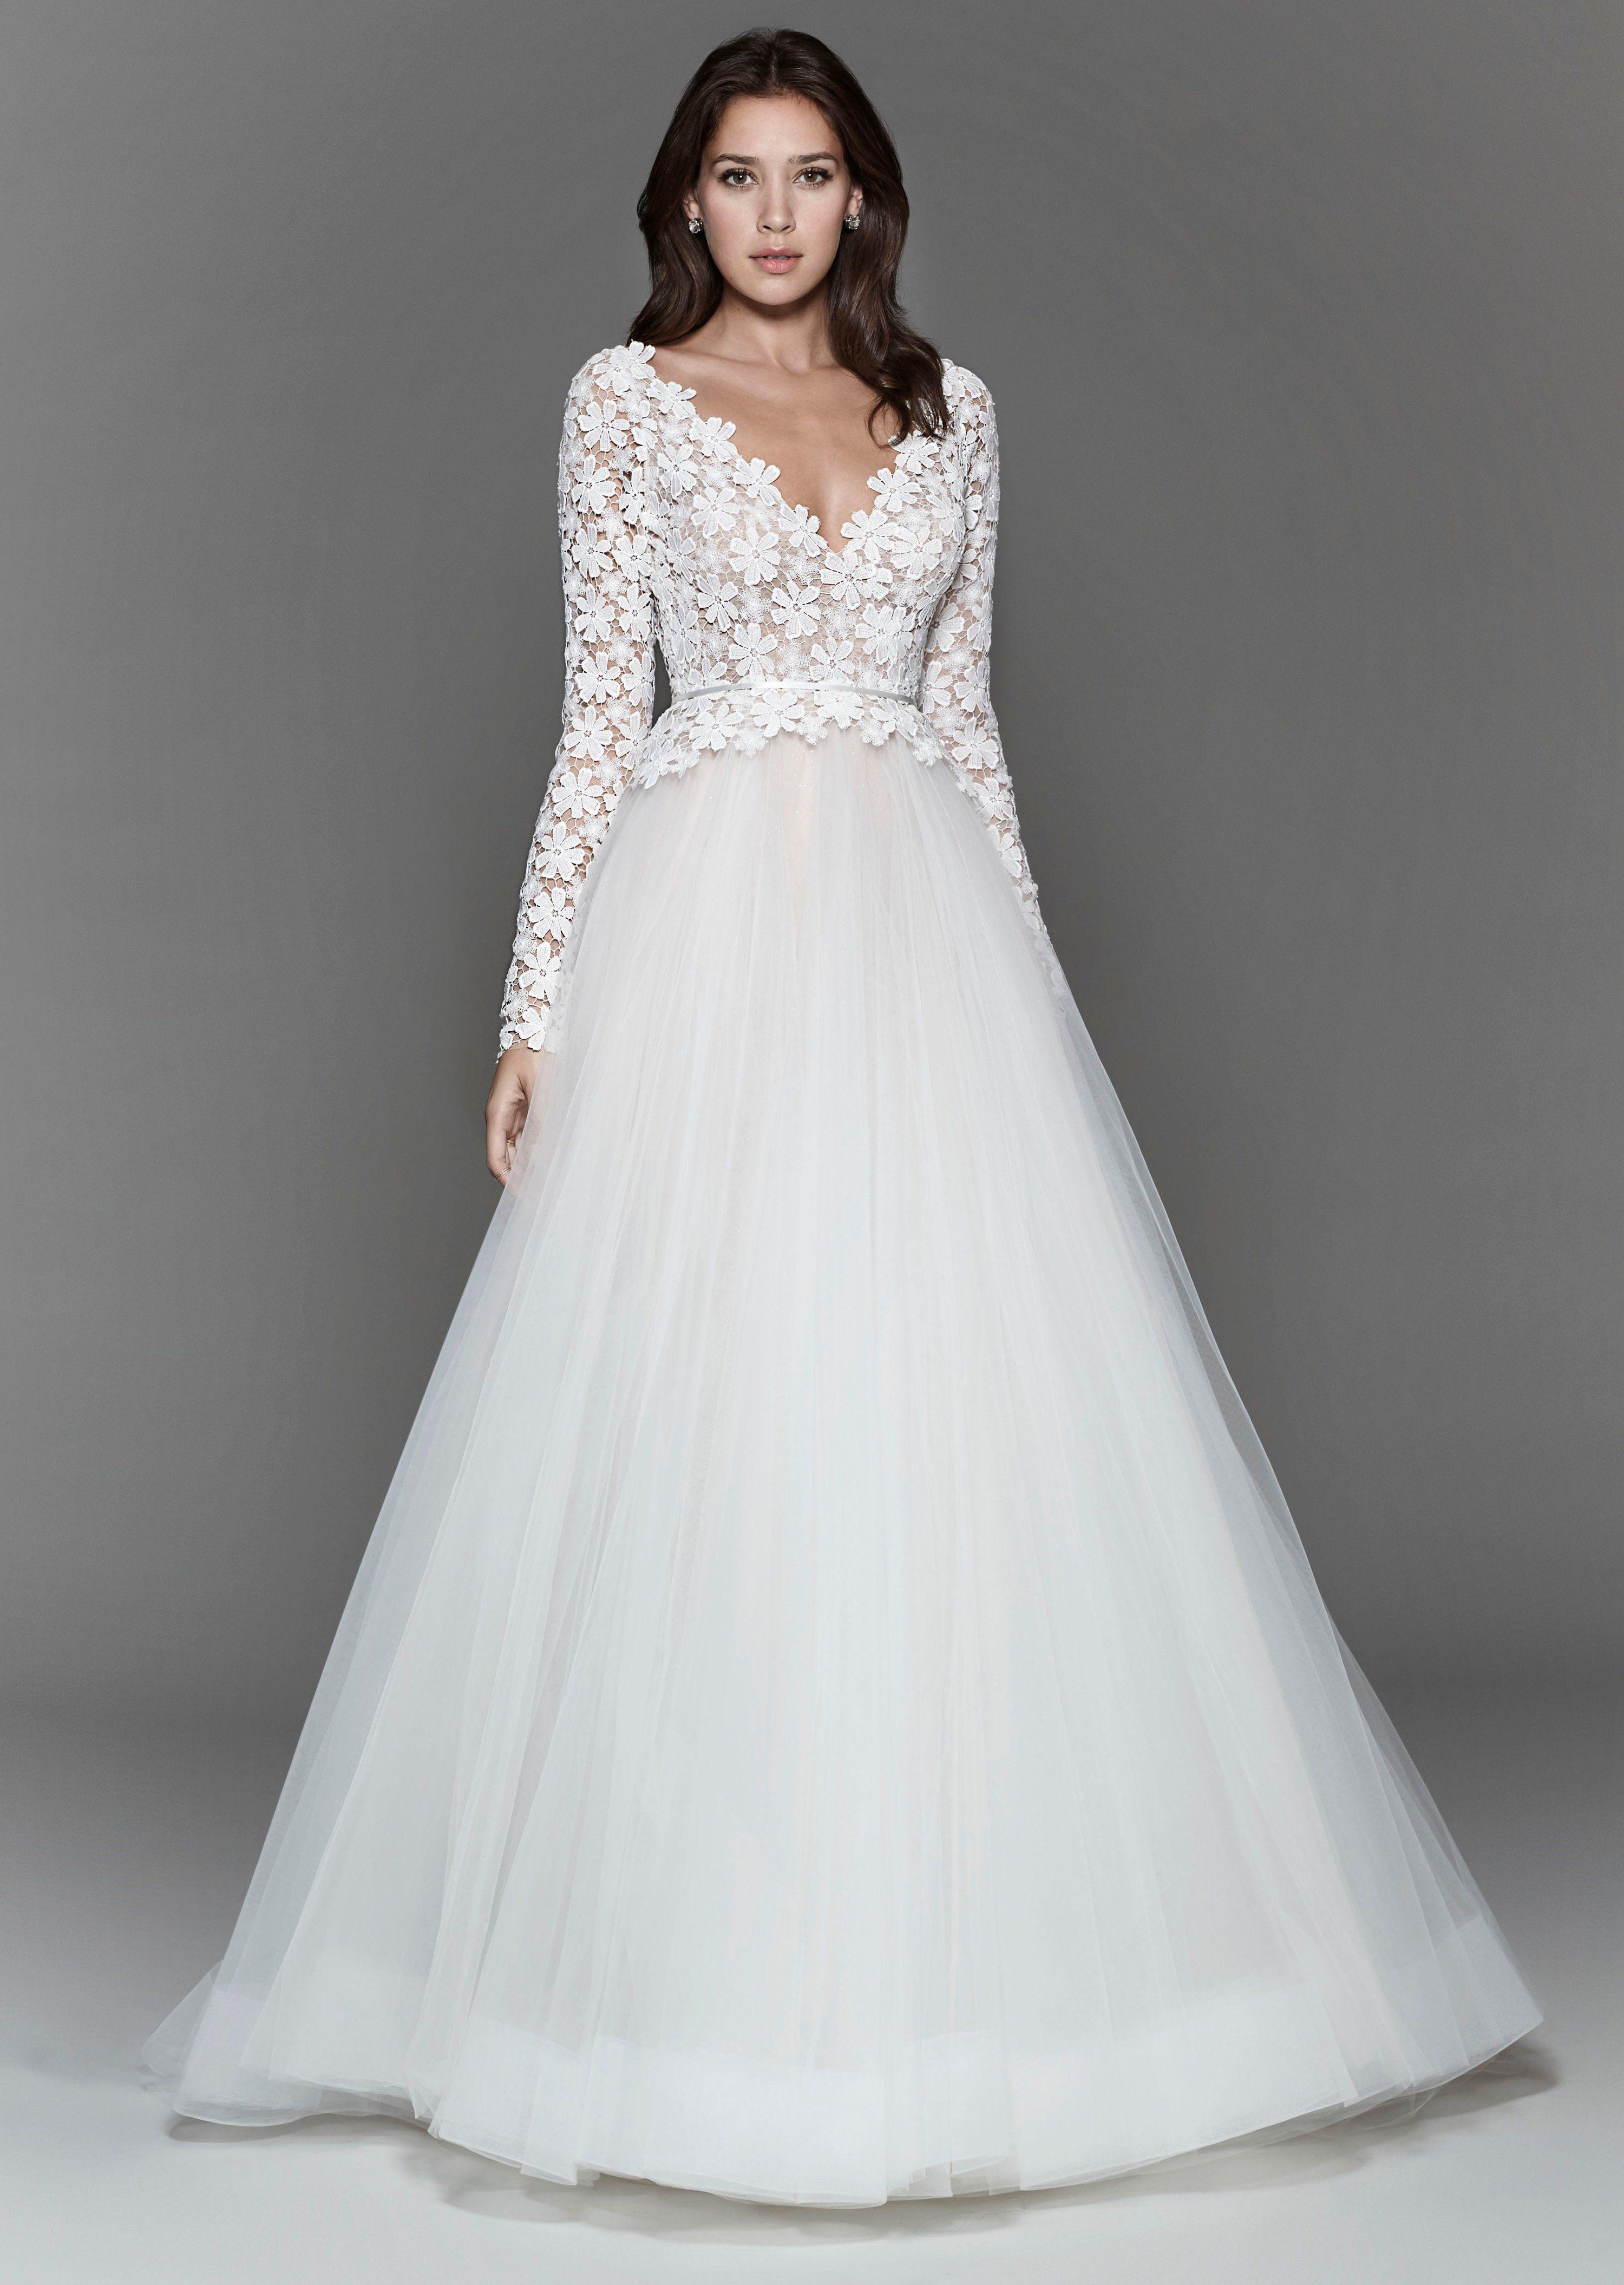 Scottish wedding dresses  Tara Keely   Wedding Dresses u Co  Pinterest  Wedding dress